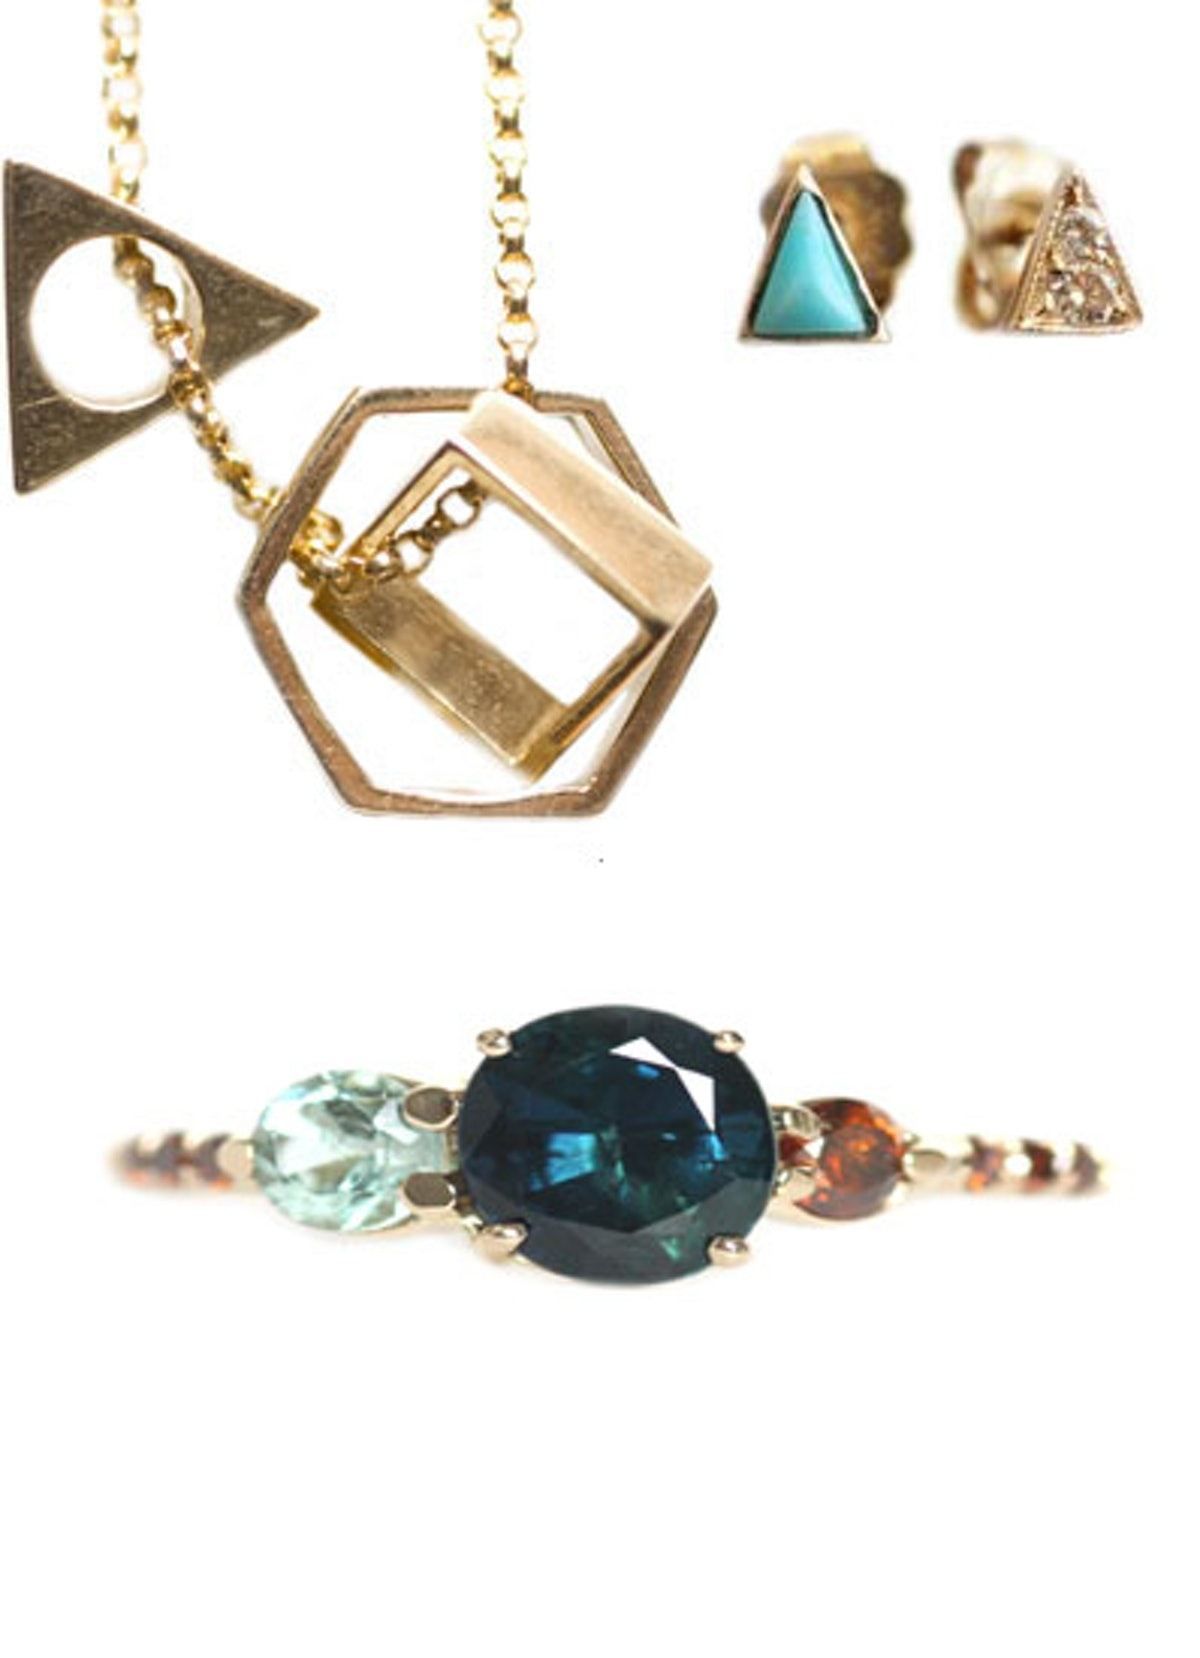 acss-brooklyn-jewelry-04-v.jpg